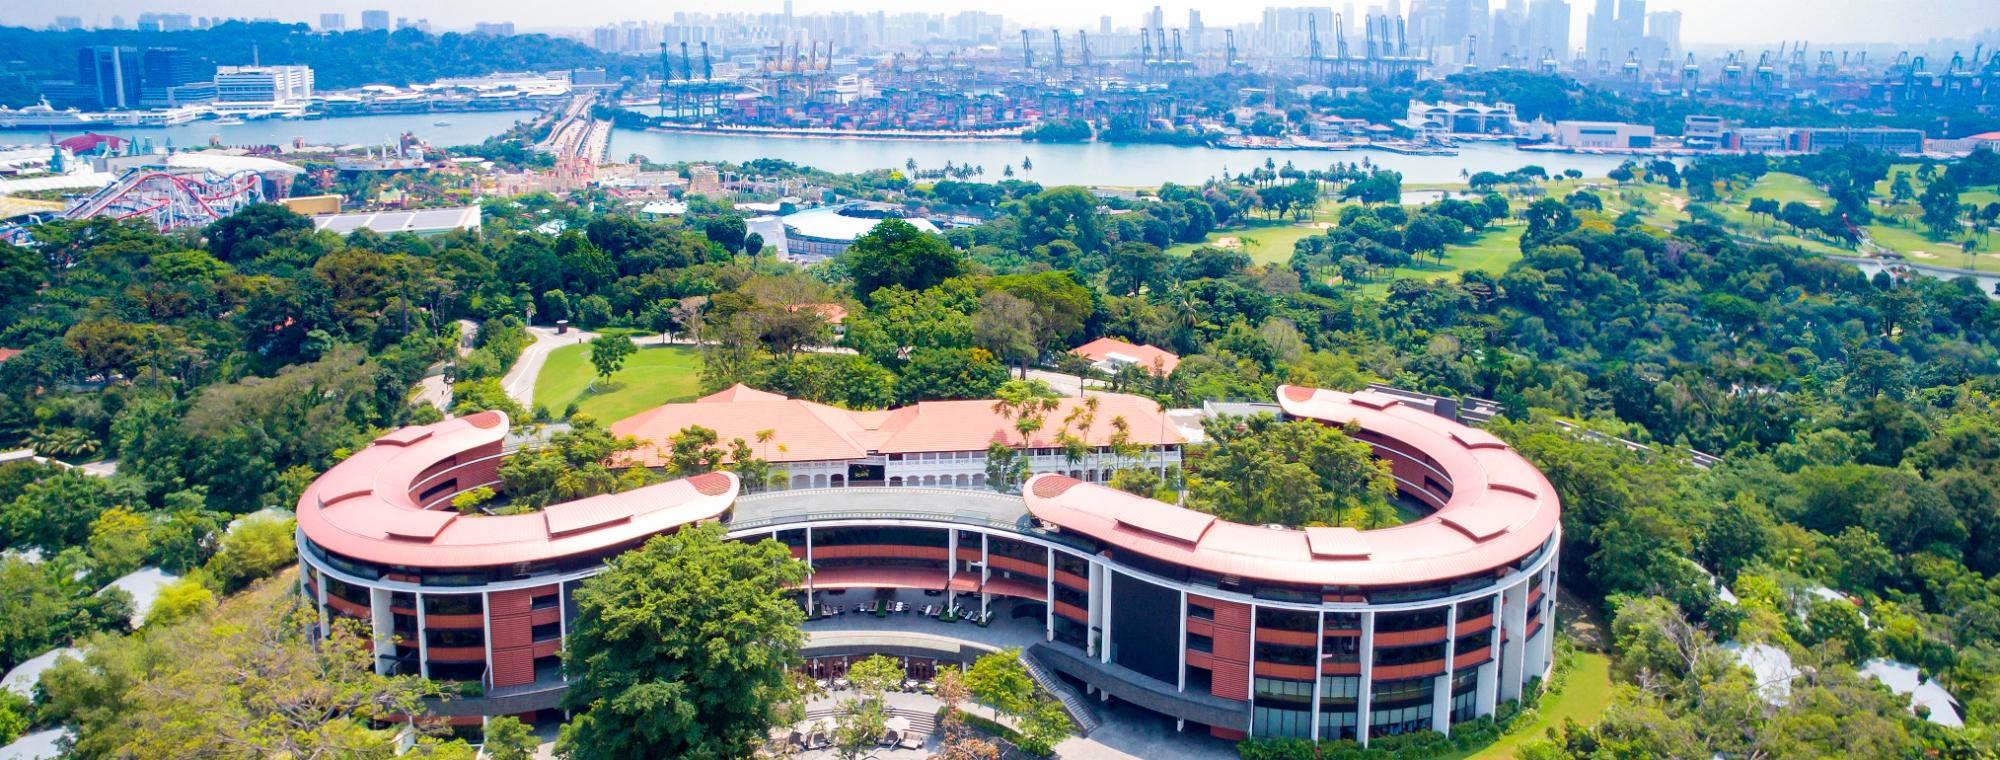 Capella Resort, Sentosa island, Singapore